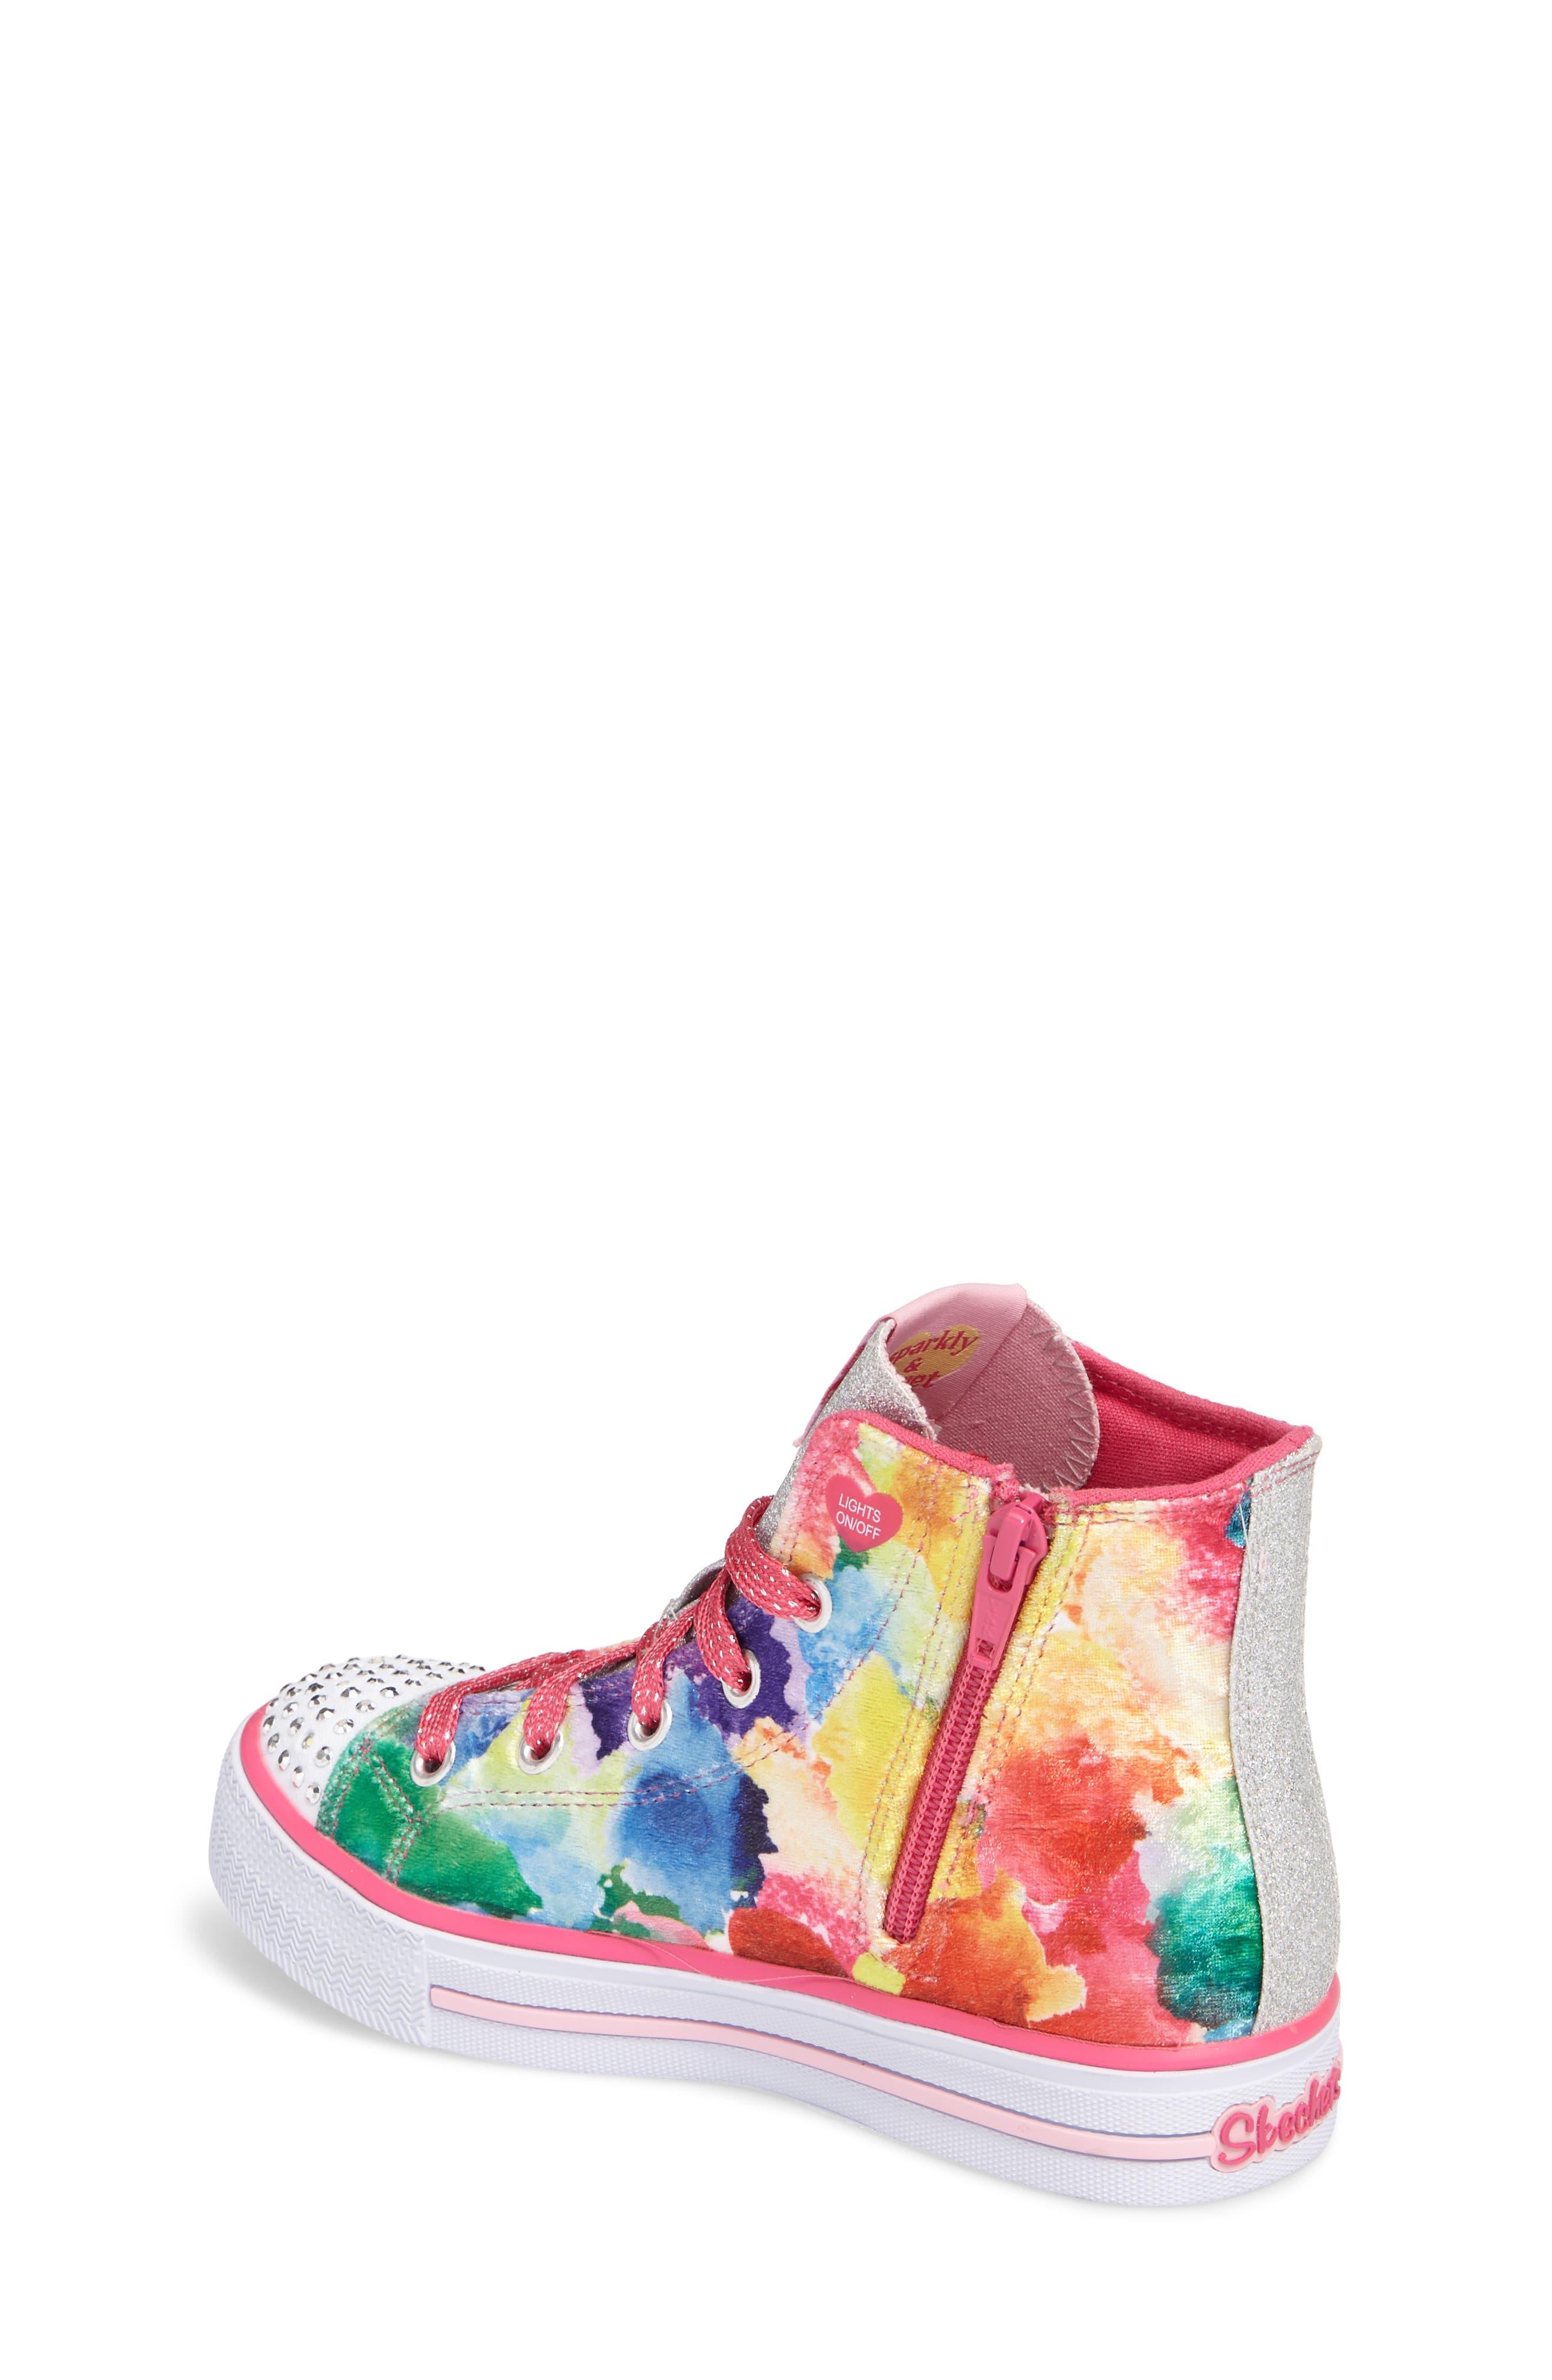 SKECHERS,                             Twinkle Toes Shuffles Light-Up High Top Sneaker,                             Alternate thumbnail 2, color,                             650